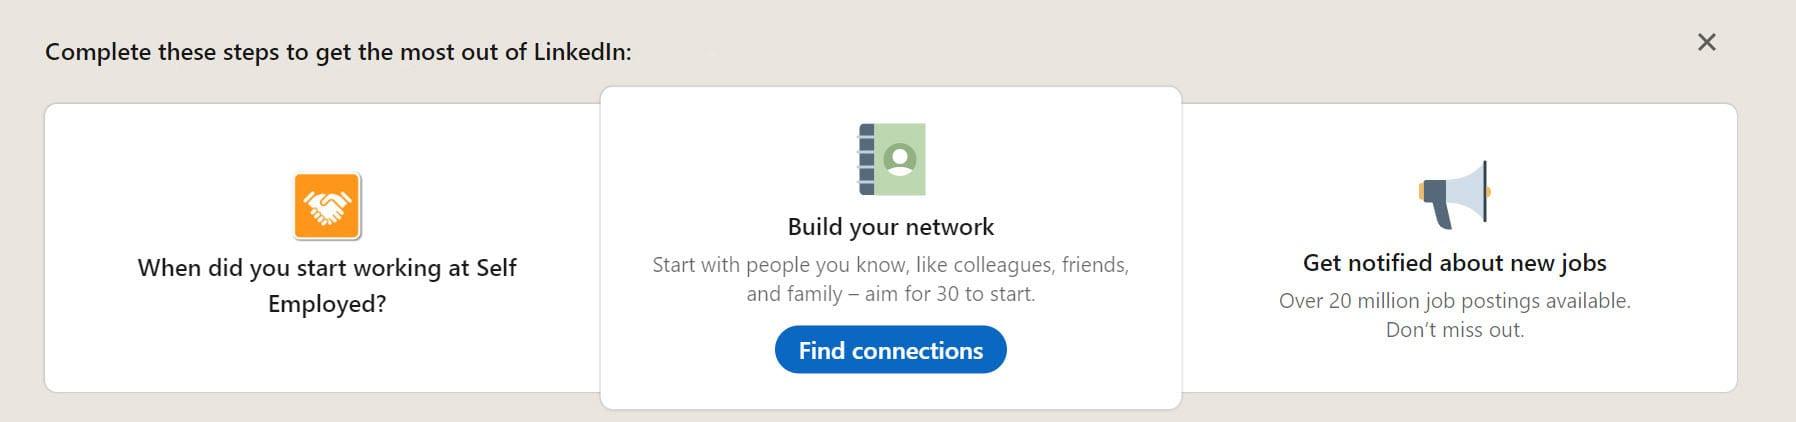 A screenhot of LinkedIn during account setup